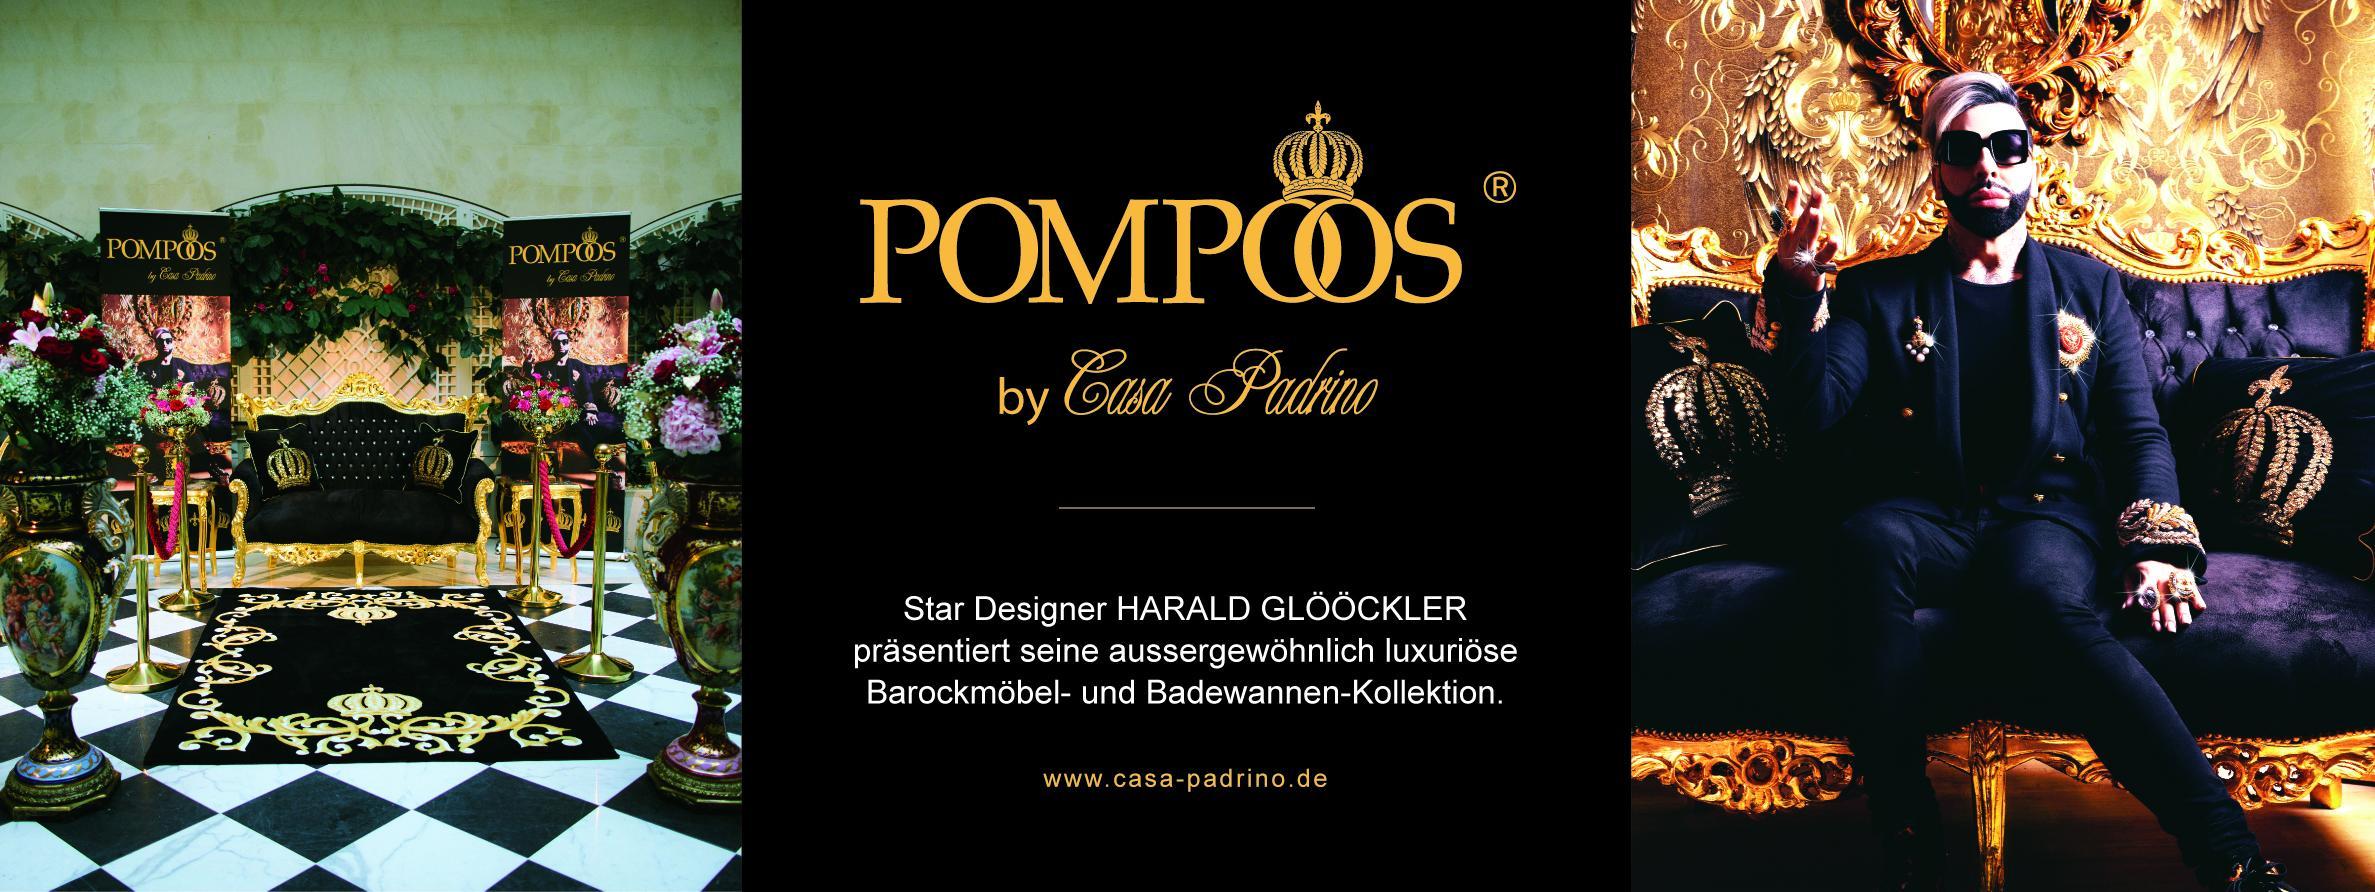 luxus designer porzellan aus der pomp s by casa padrino kollektion von harald gl ckler. Black Bedroom Furniture Sets. Home Design Ideas